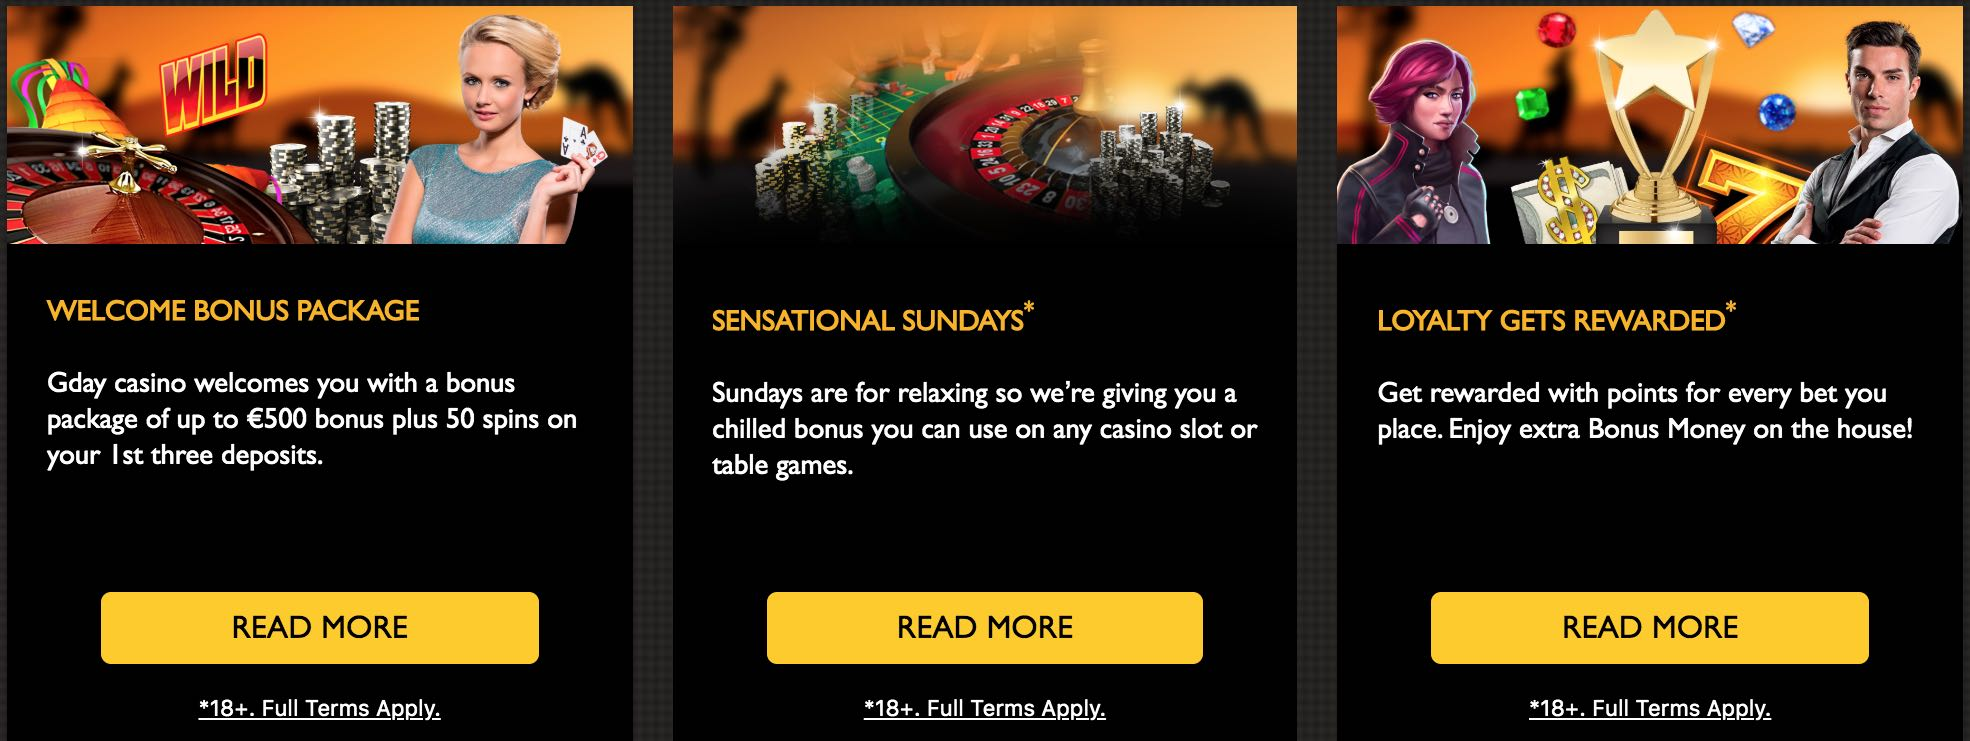 Gday Casino Bonus Codes – GDayCasino.com Free Spins July 2020